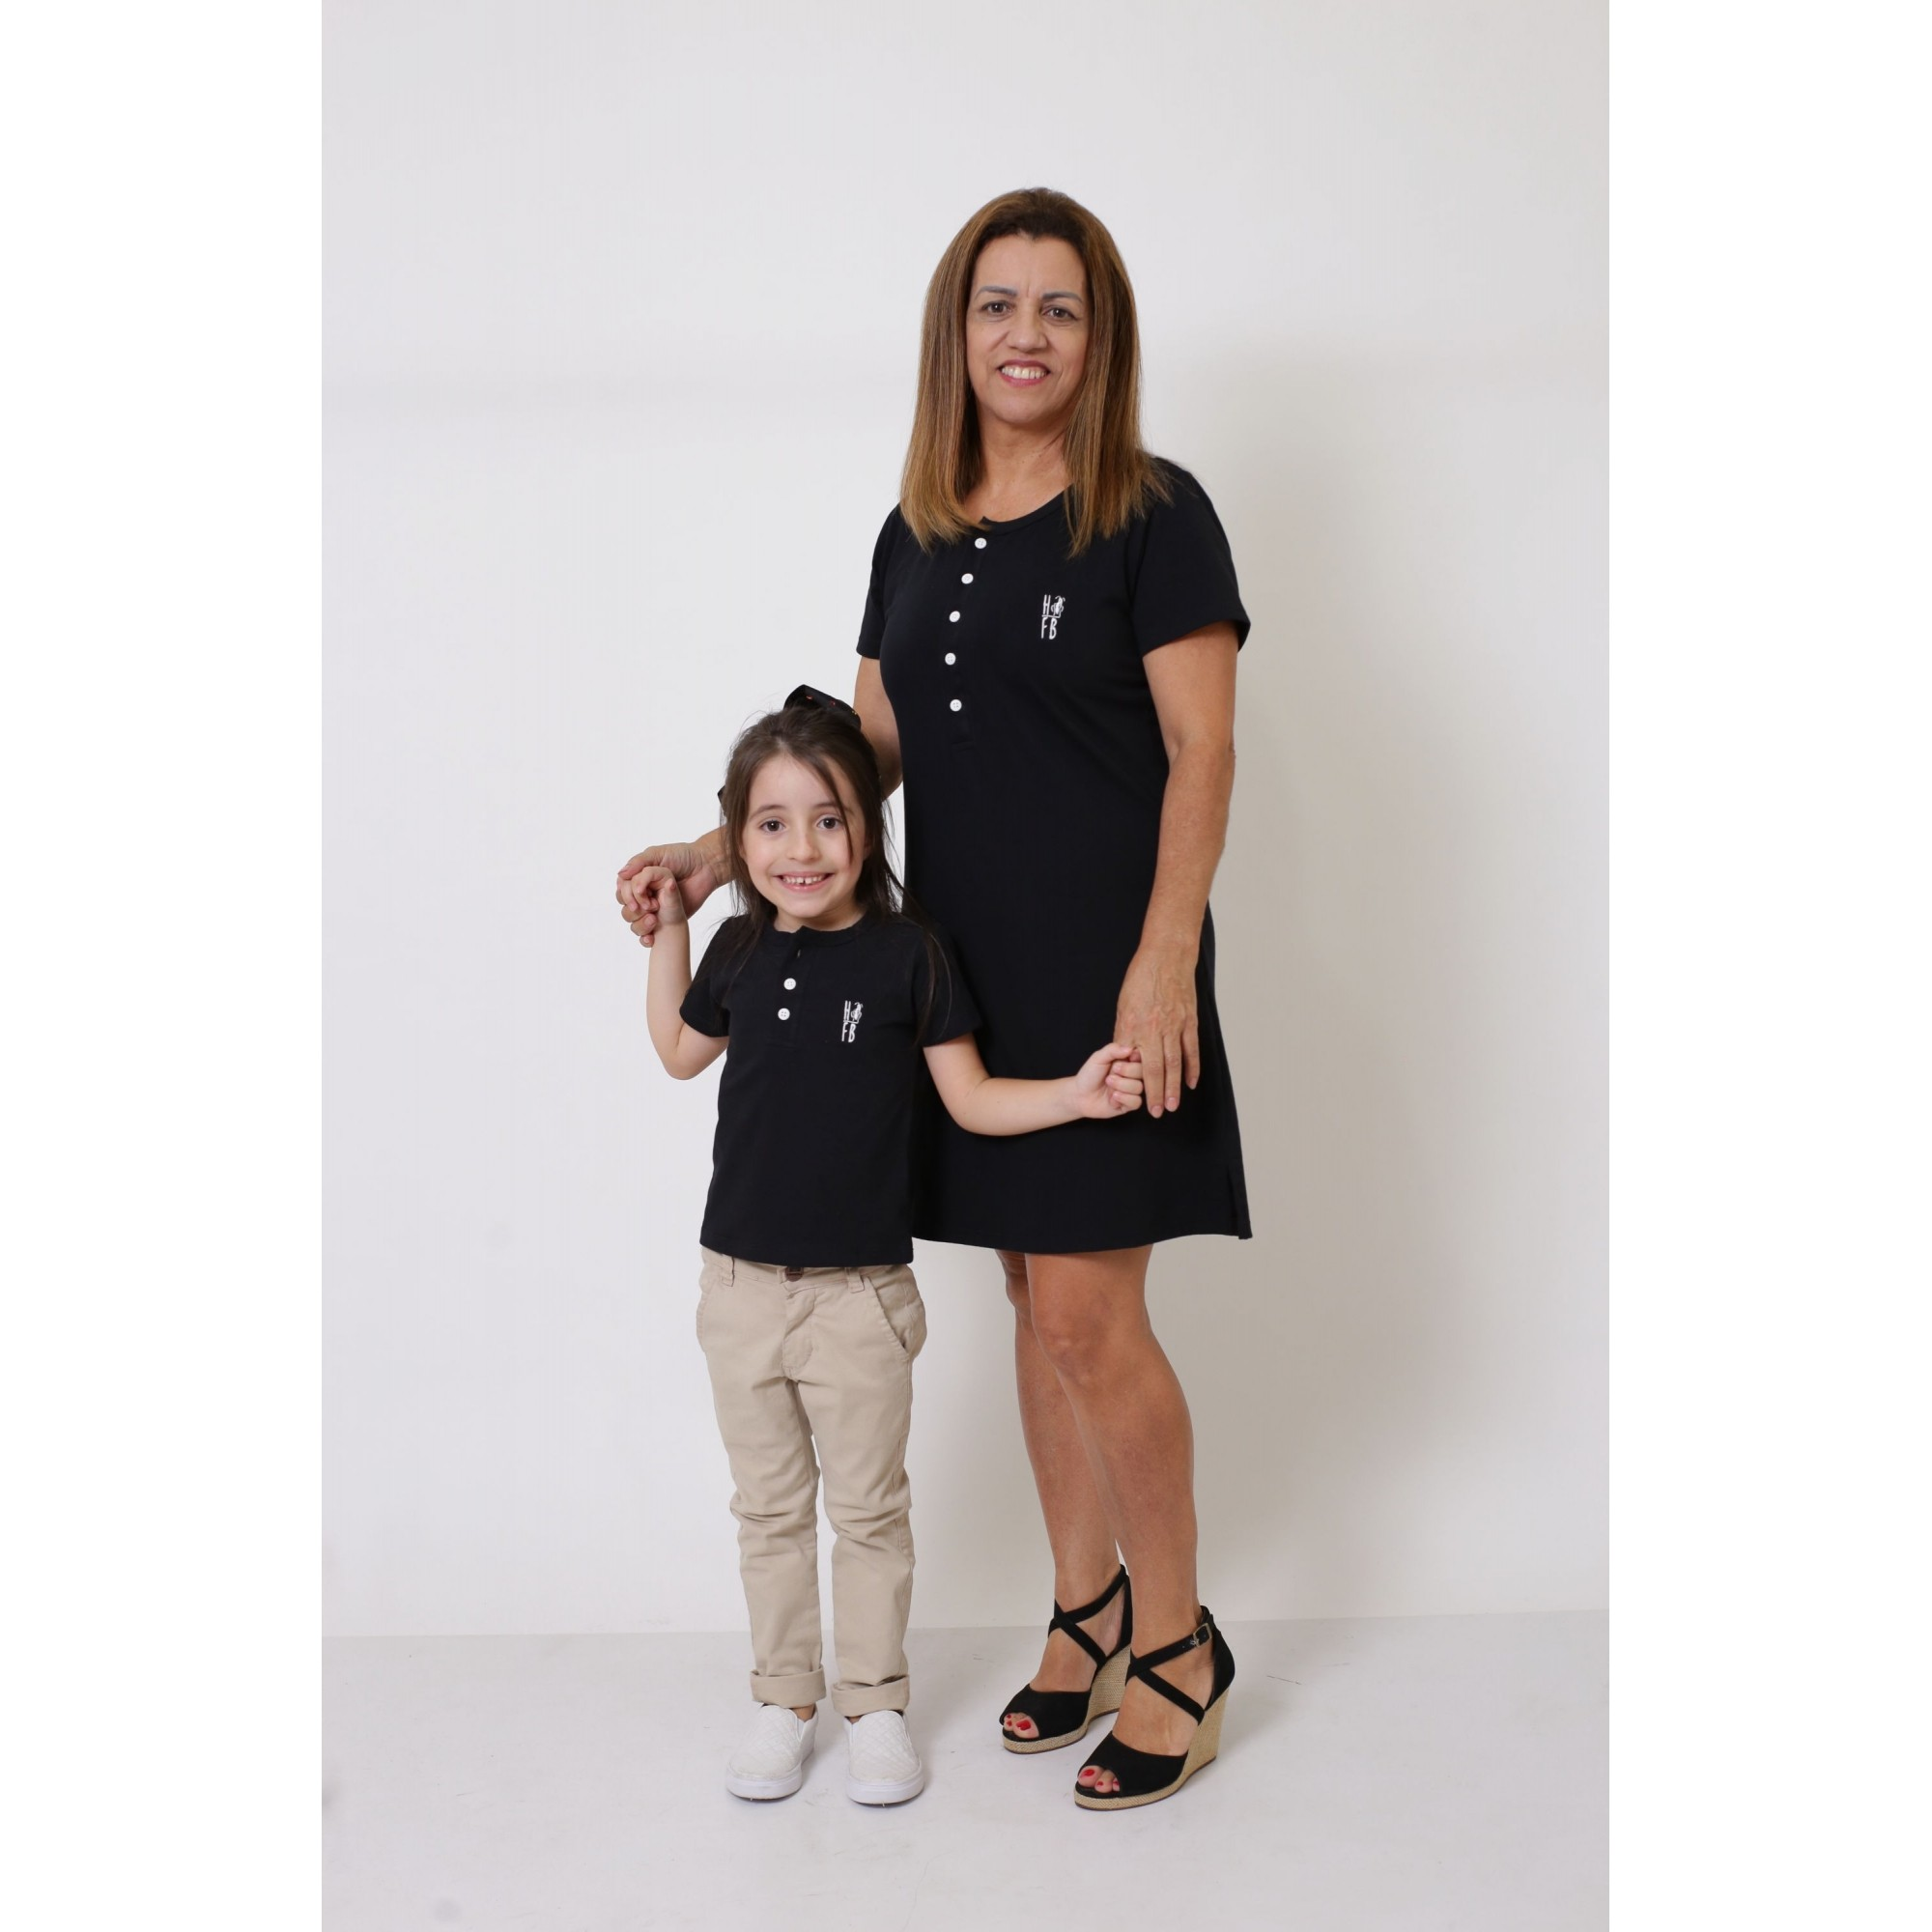 AVÓ E NETA > Kit Vestido + T-shirt Unissex ou Body Infantil - Henley - Preto [Coleção Tal Avó Tal Neta]  - Heitor Fashion Brazil